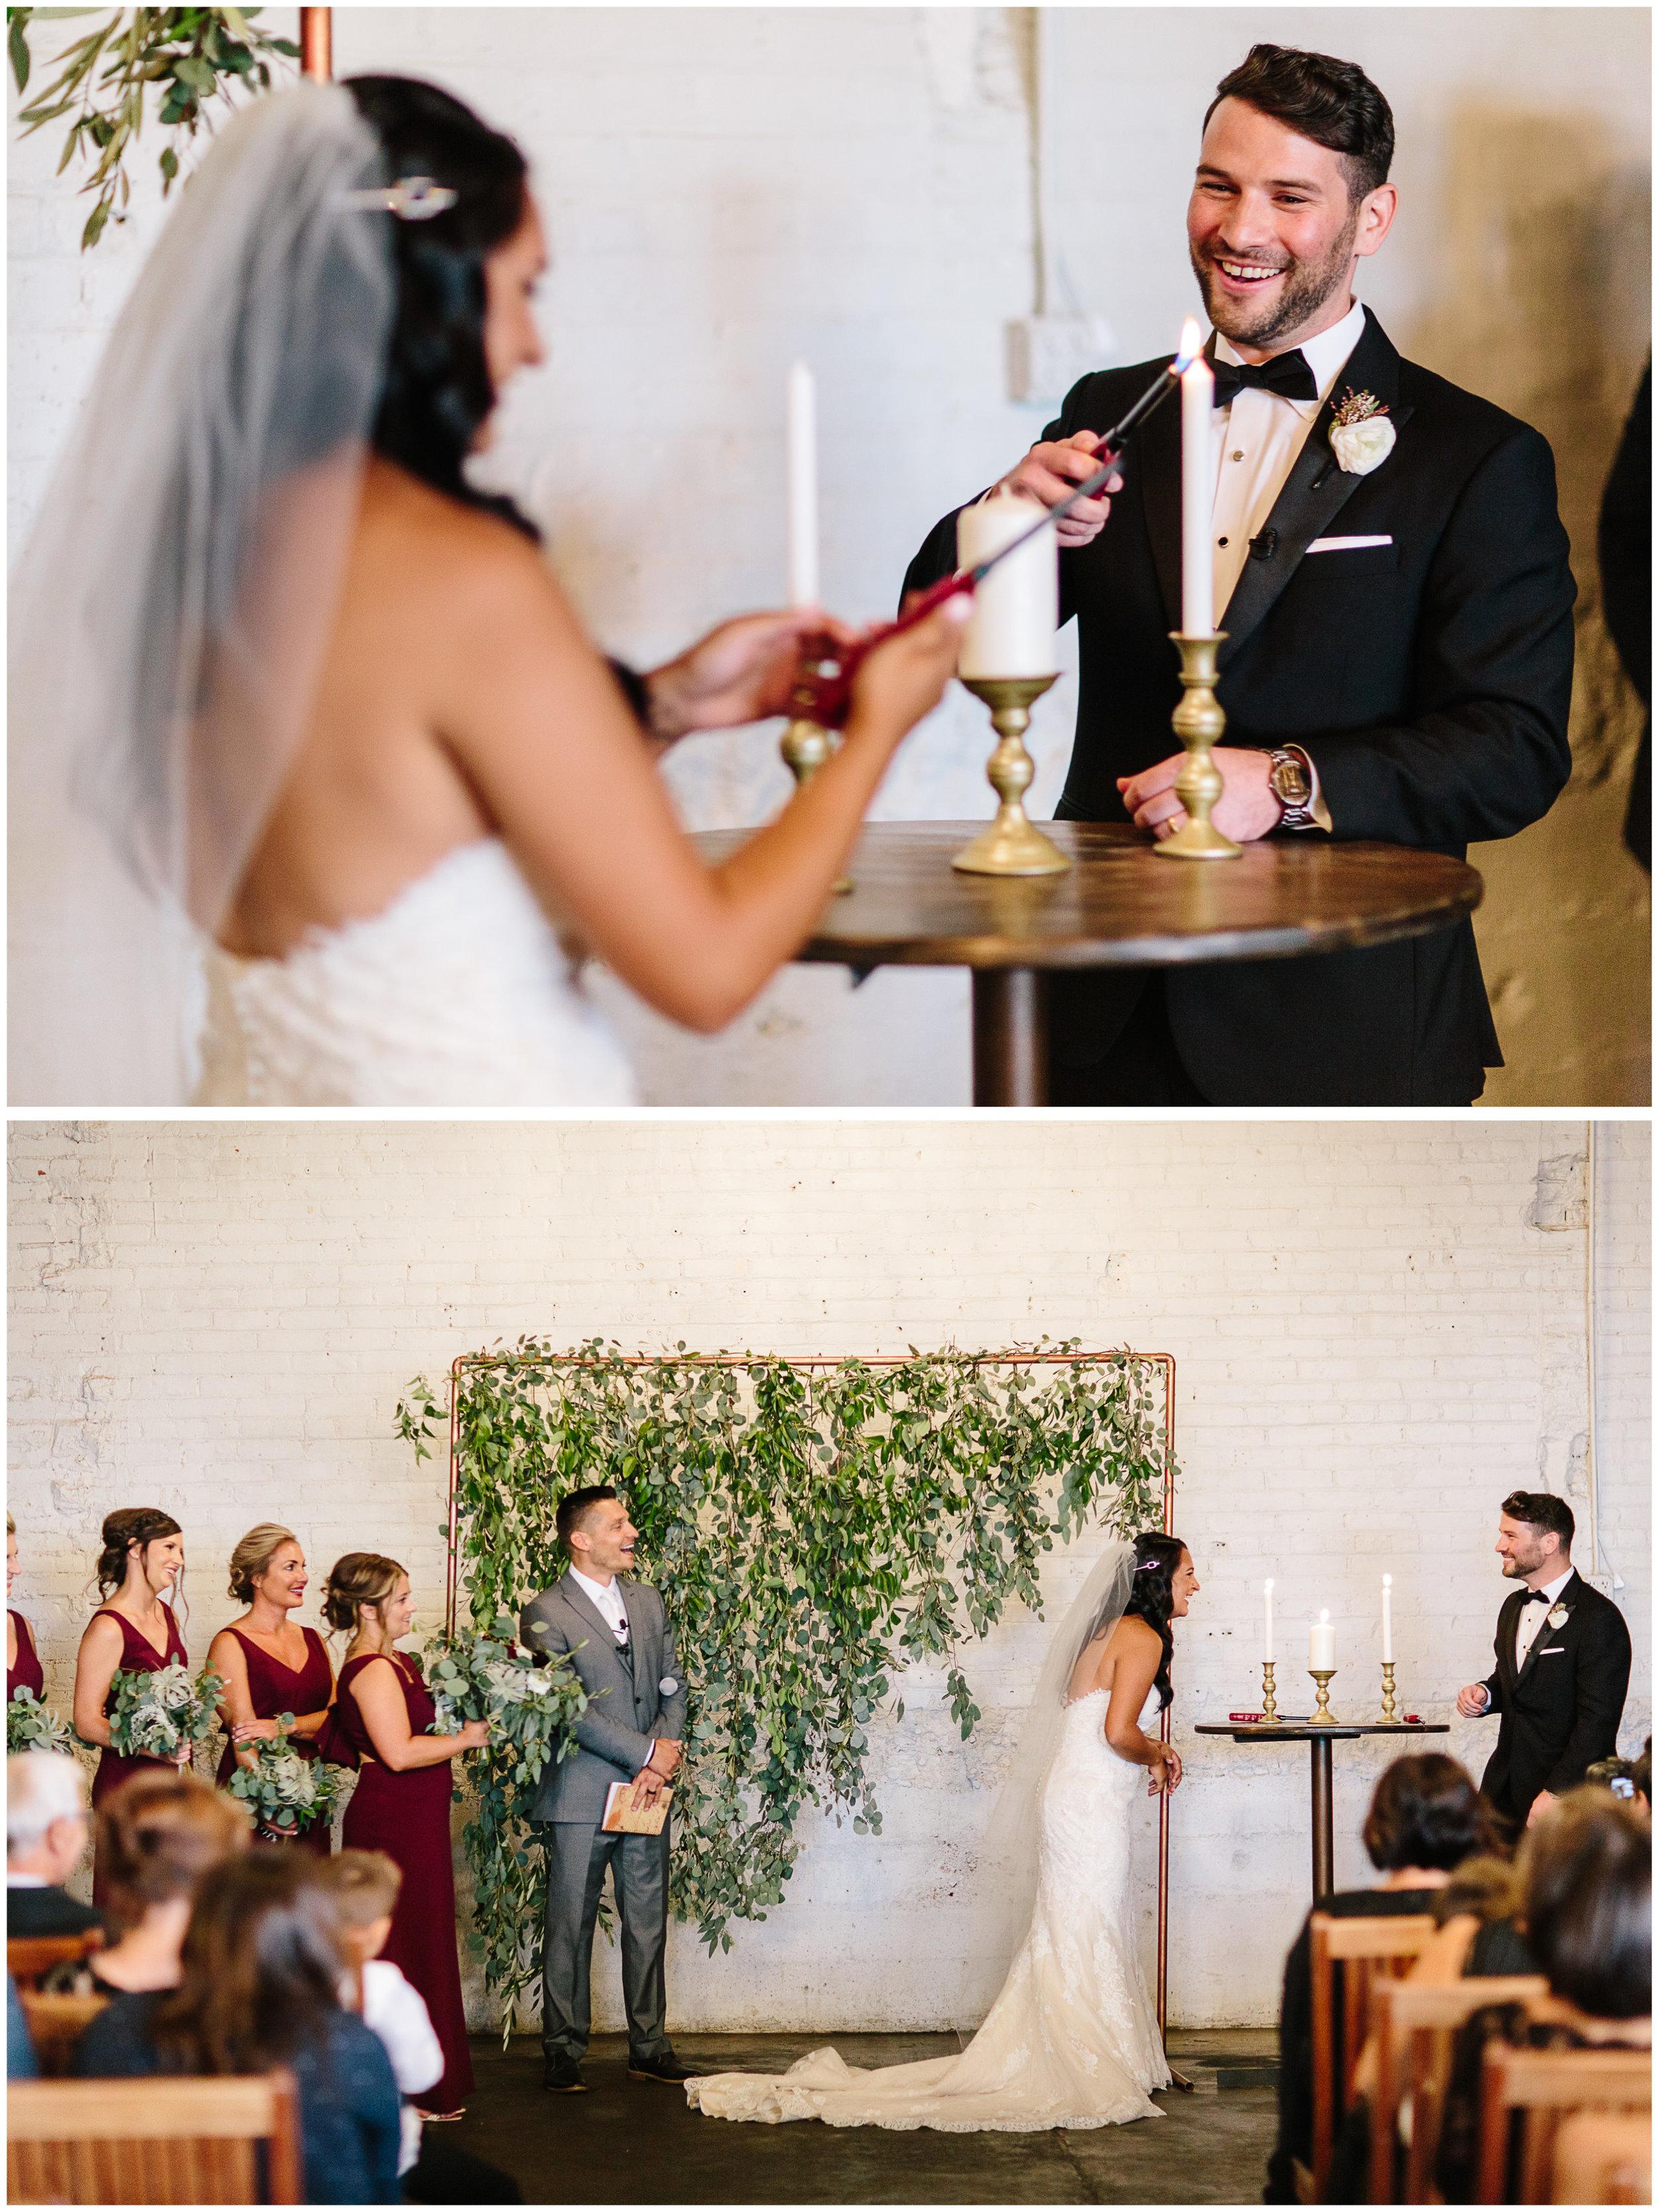 moss_denver_wedding_51.jpg